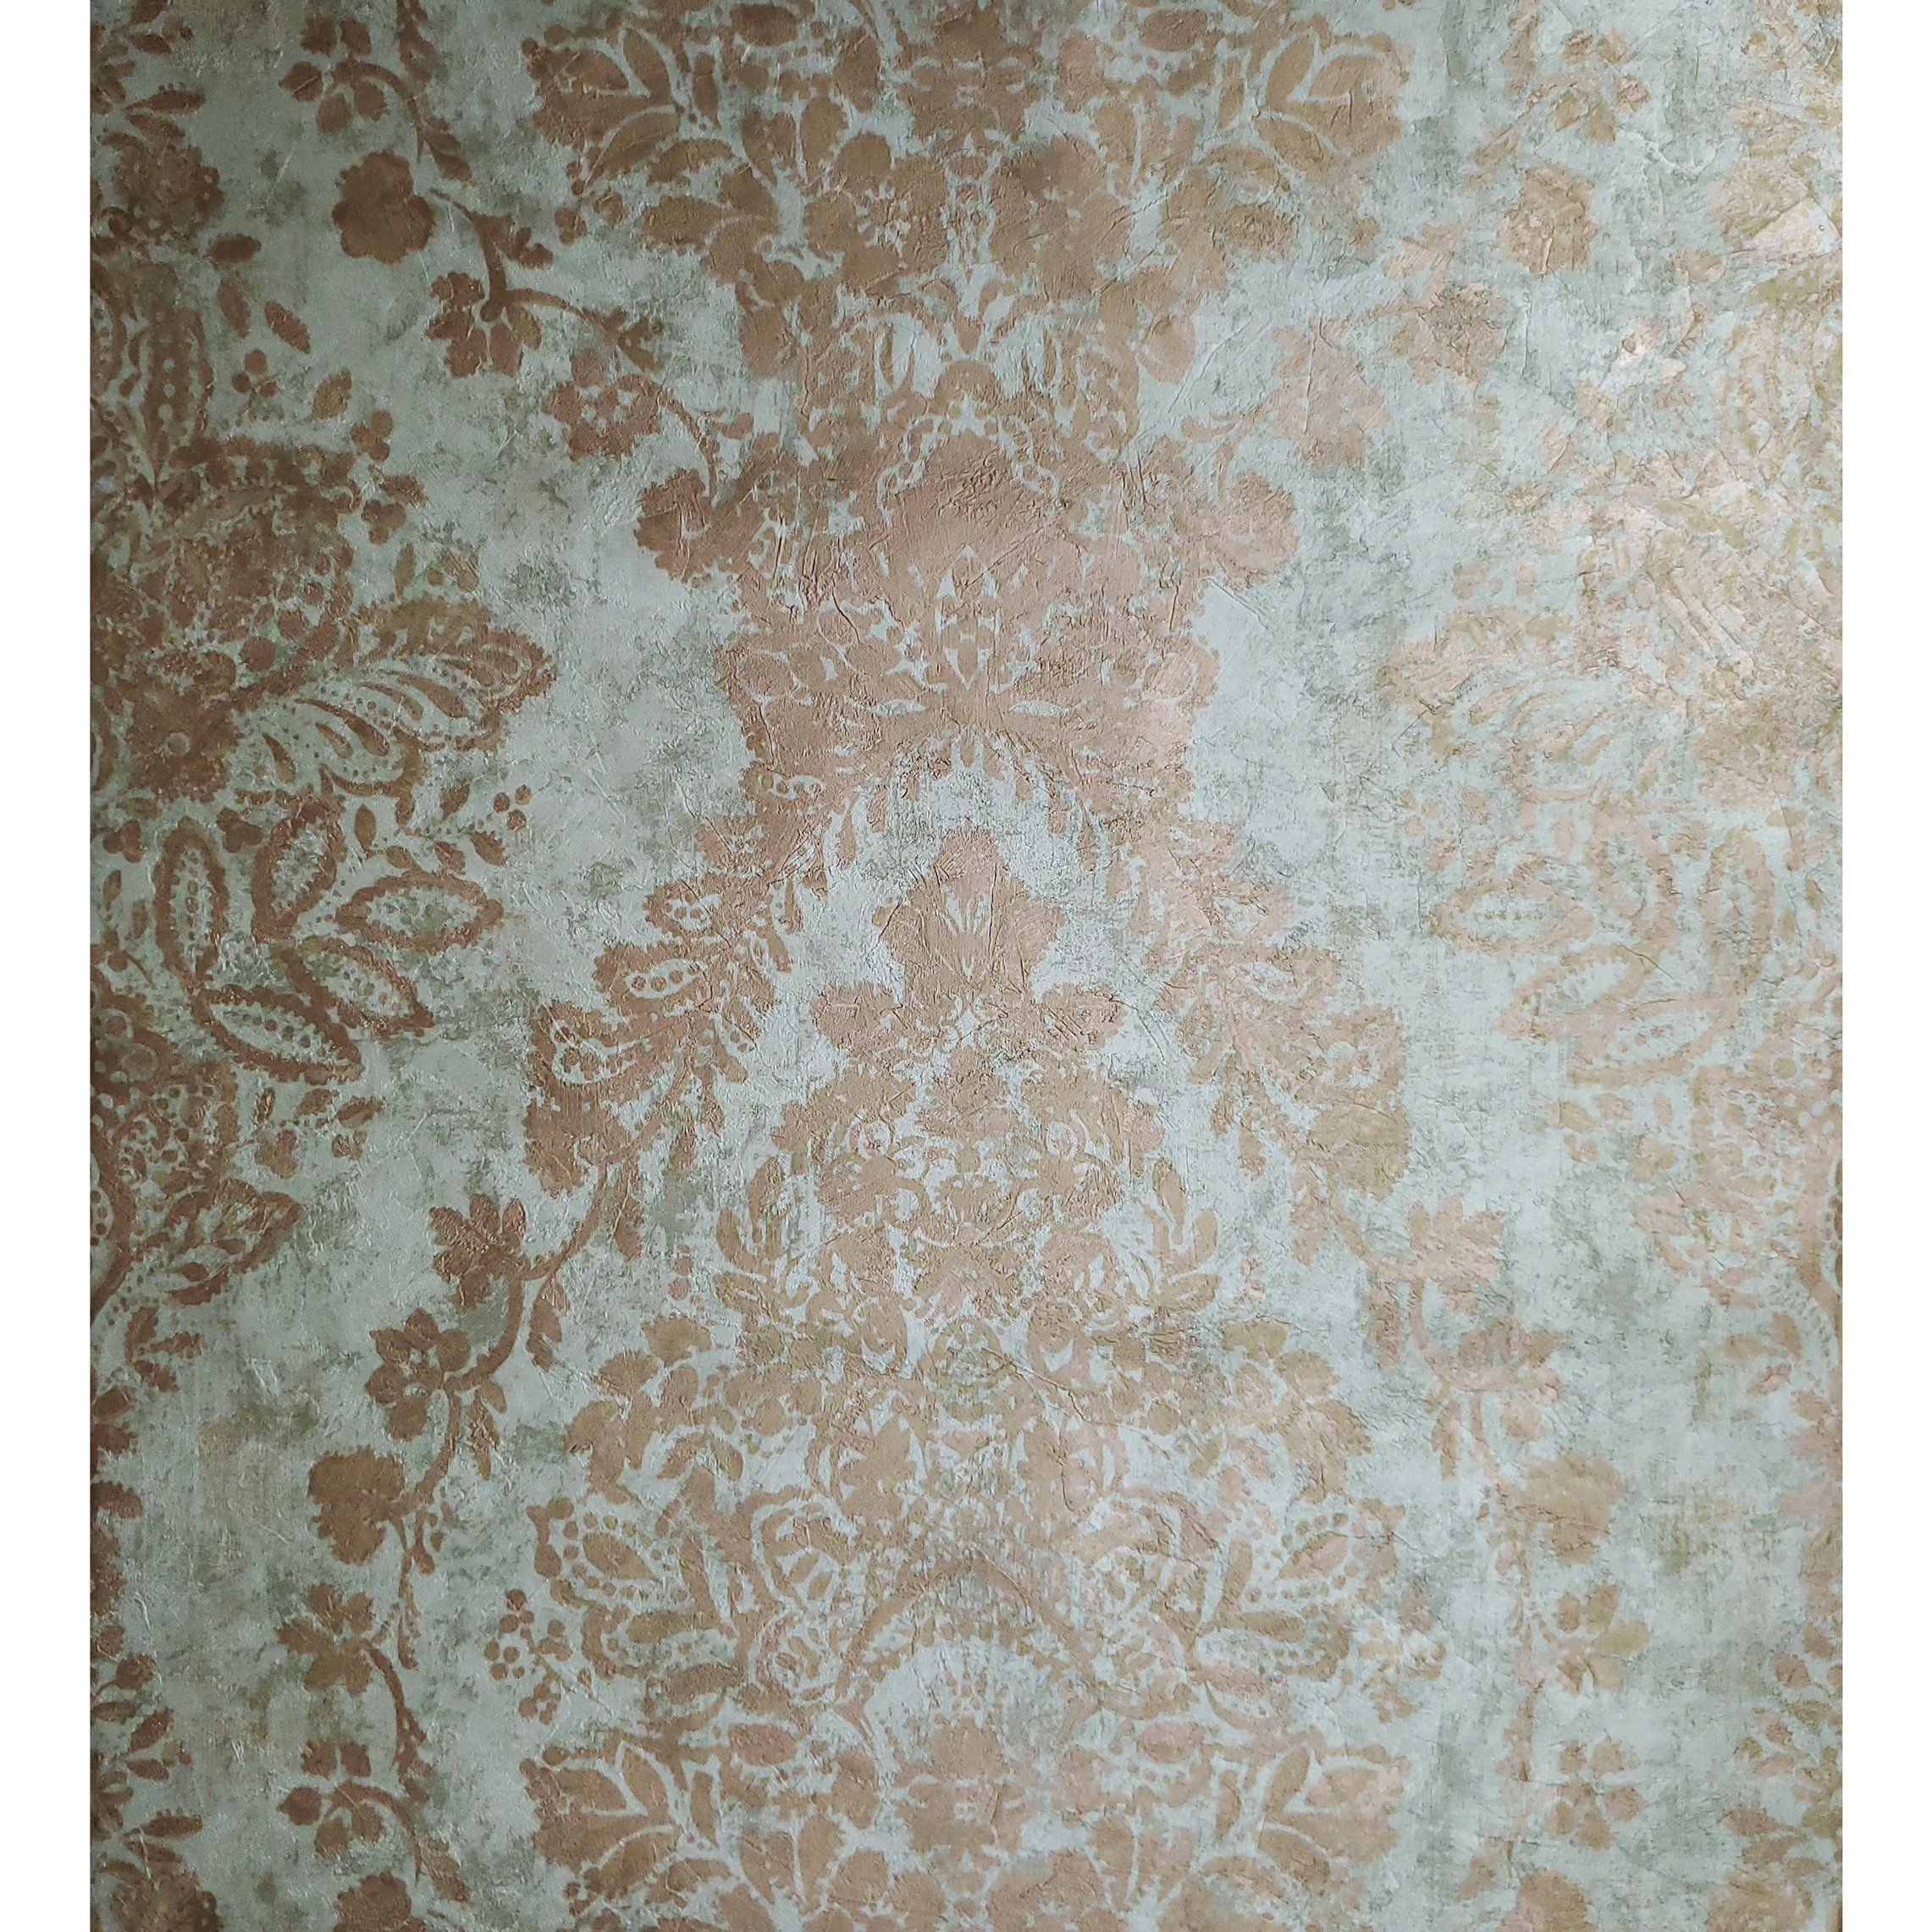 76008 Metallic Cooper Mint Green Vintage Damask Textured Wallpaper